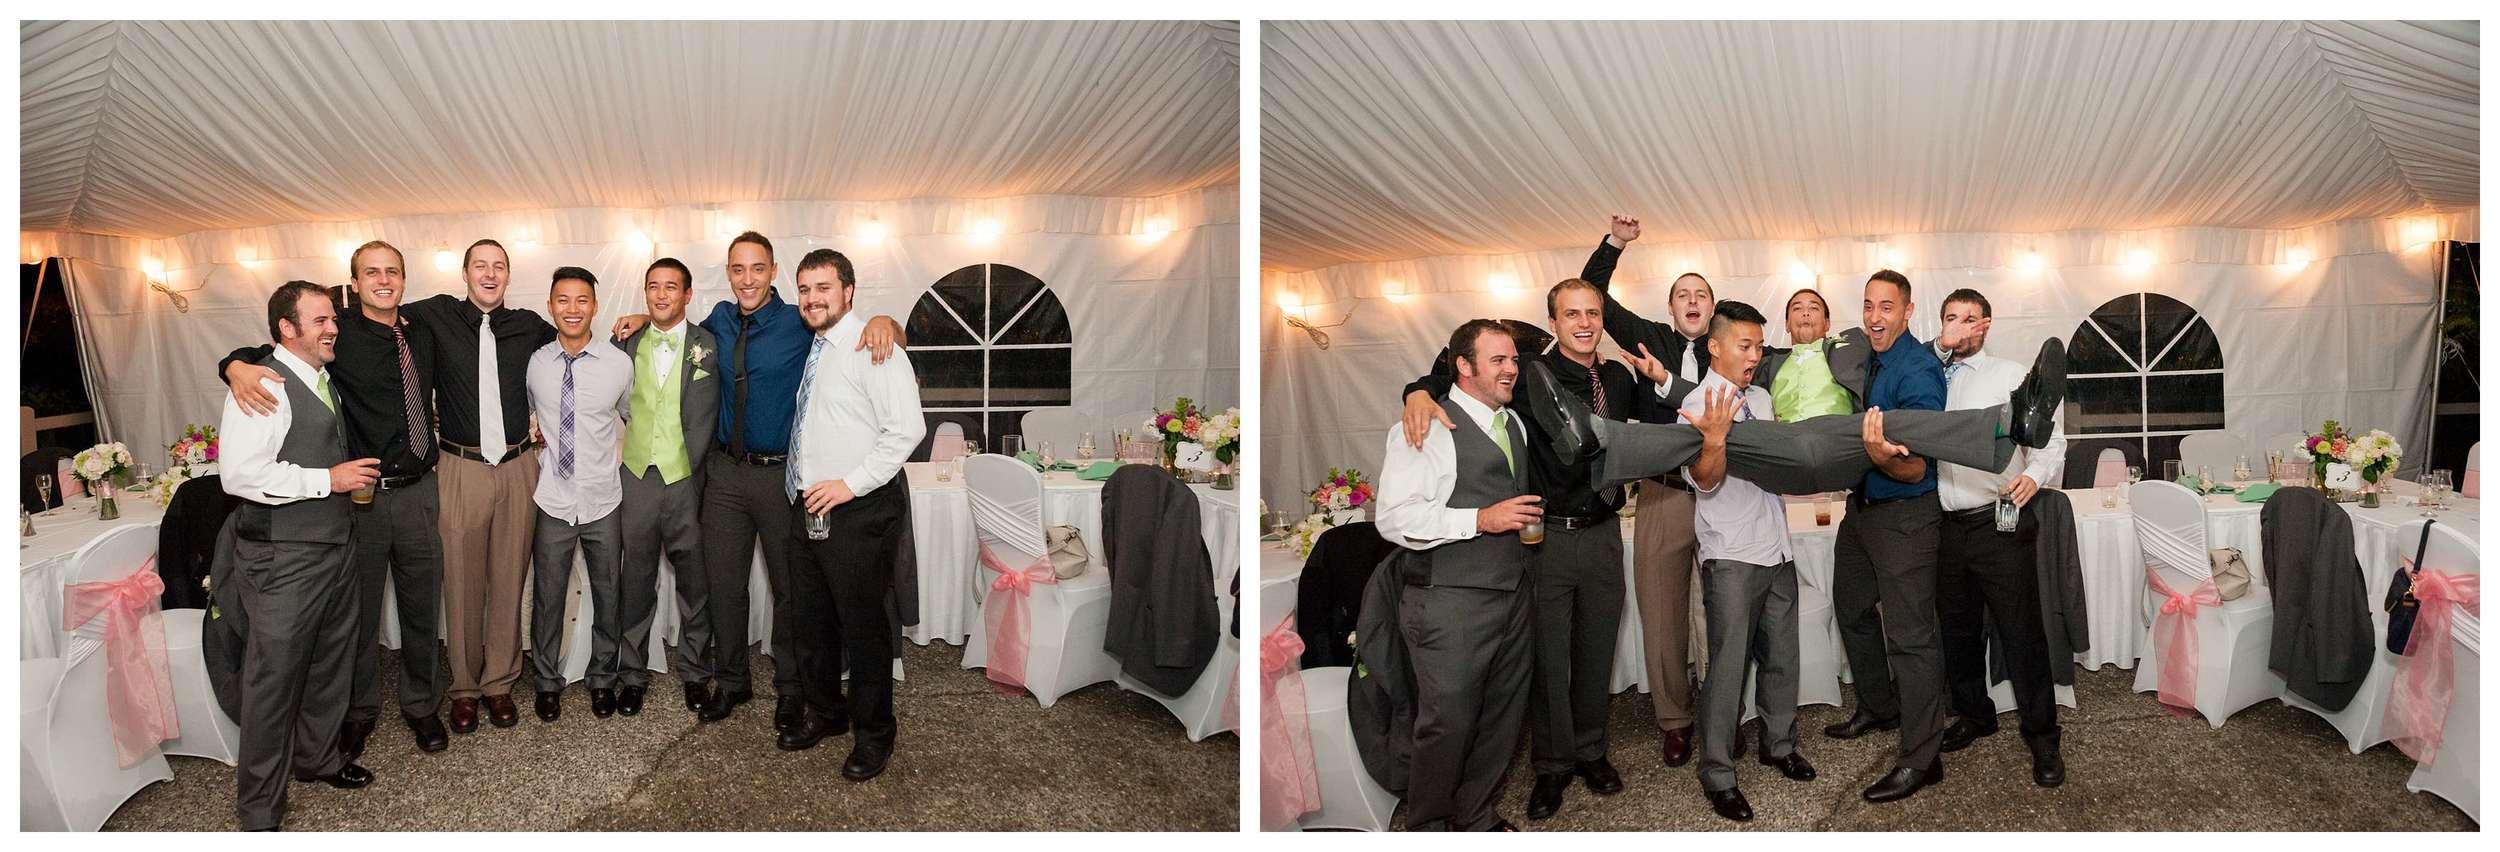 B-Jones-Photography-Seattle-Wedding-Photographer_0902.jpg